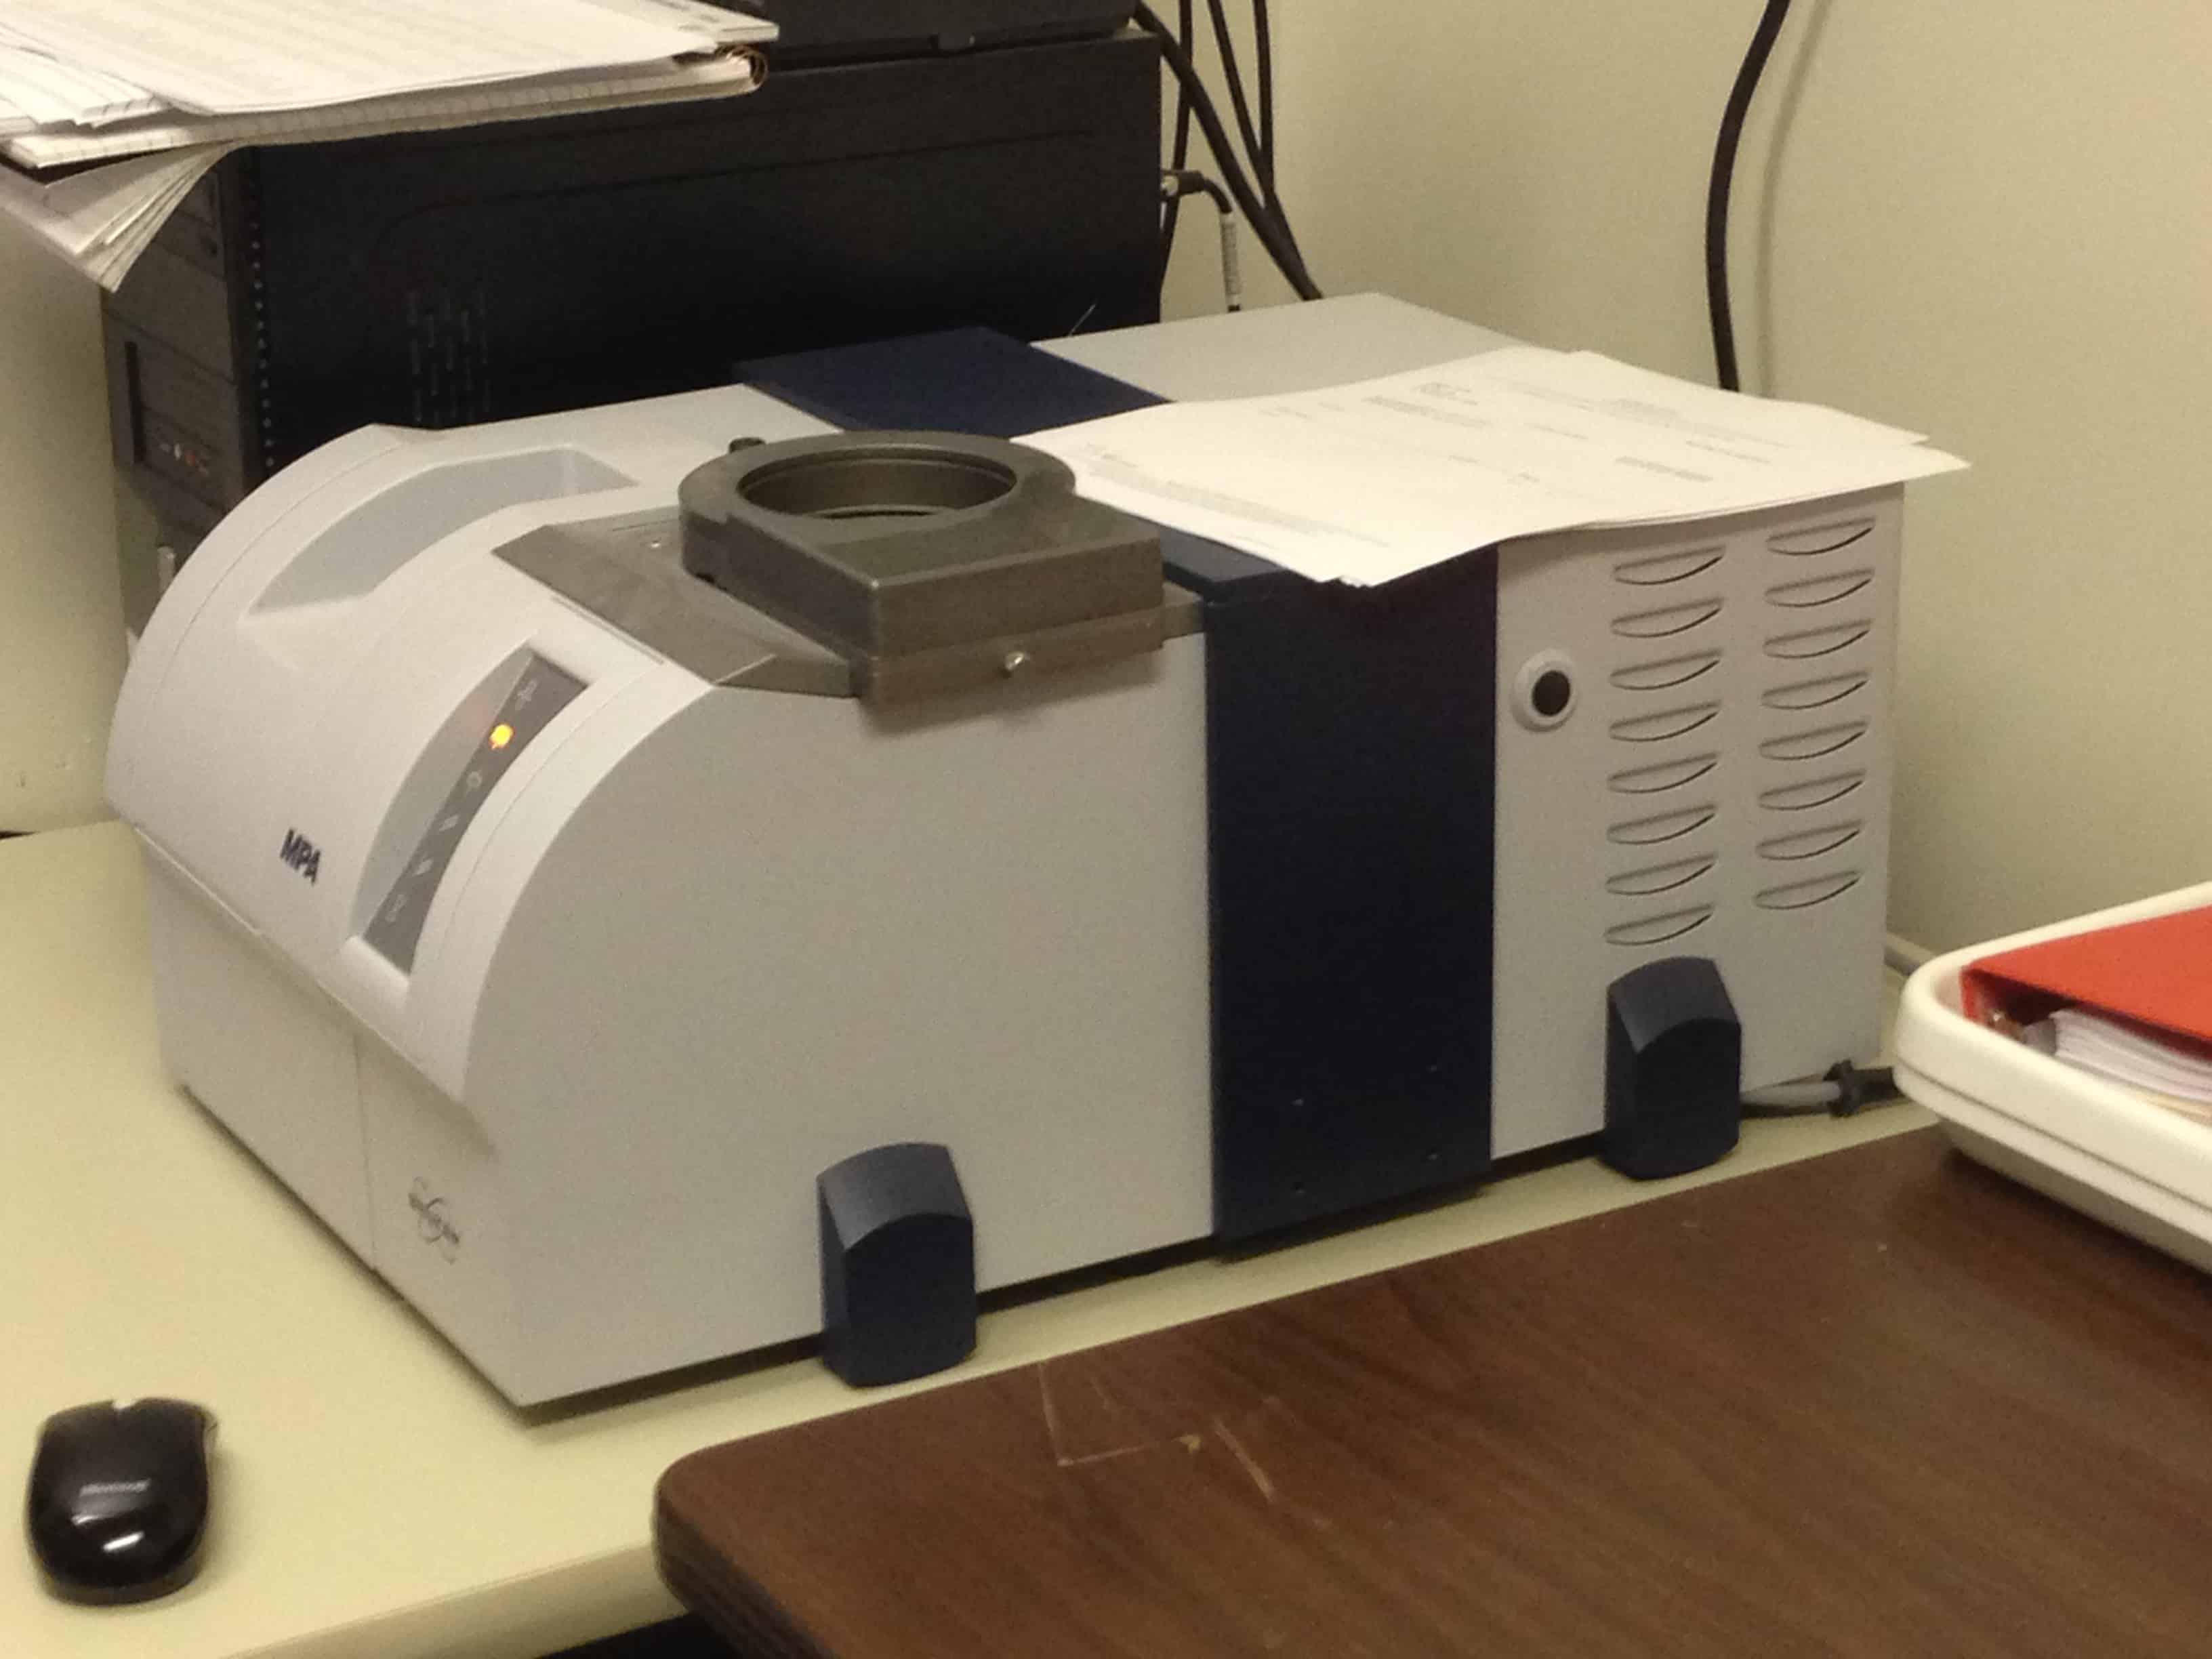 NIR testing machine